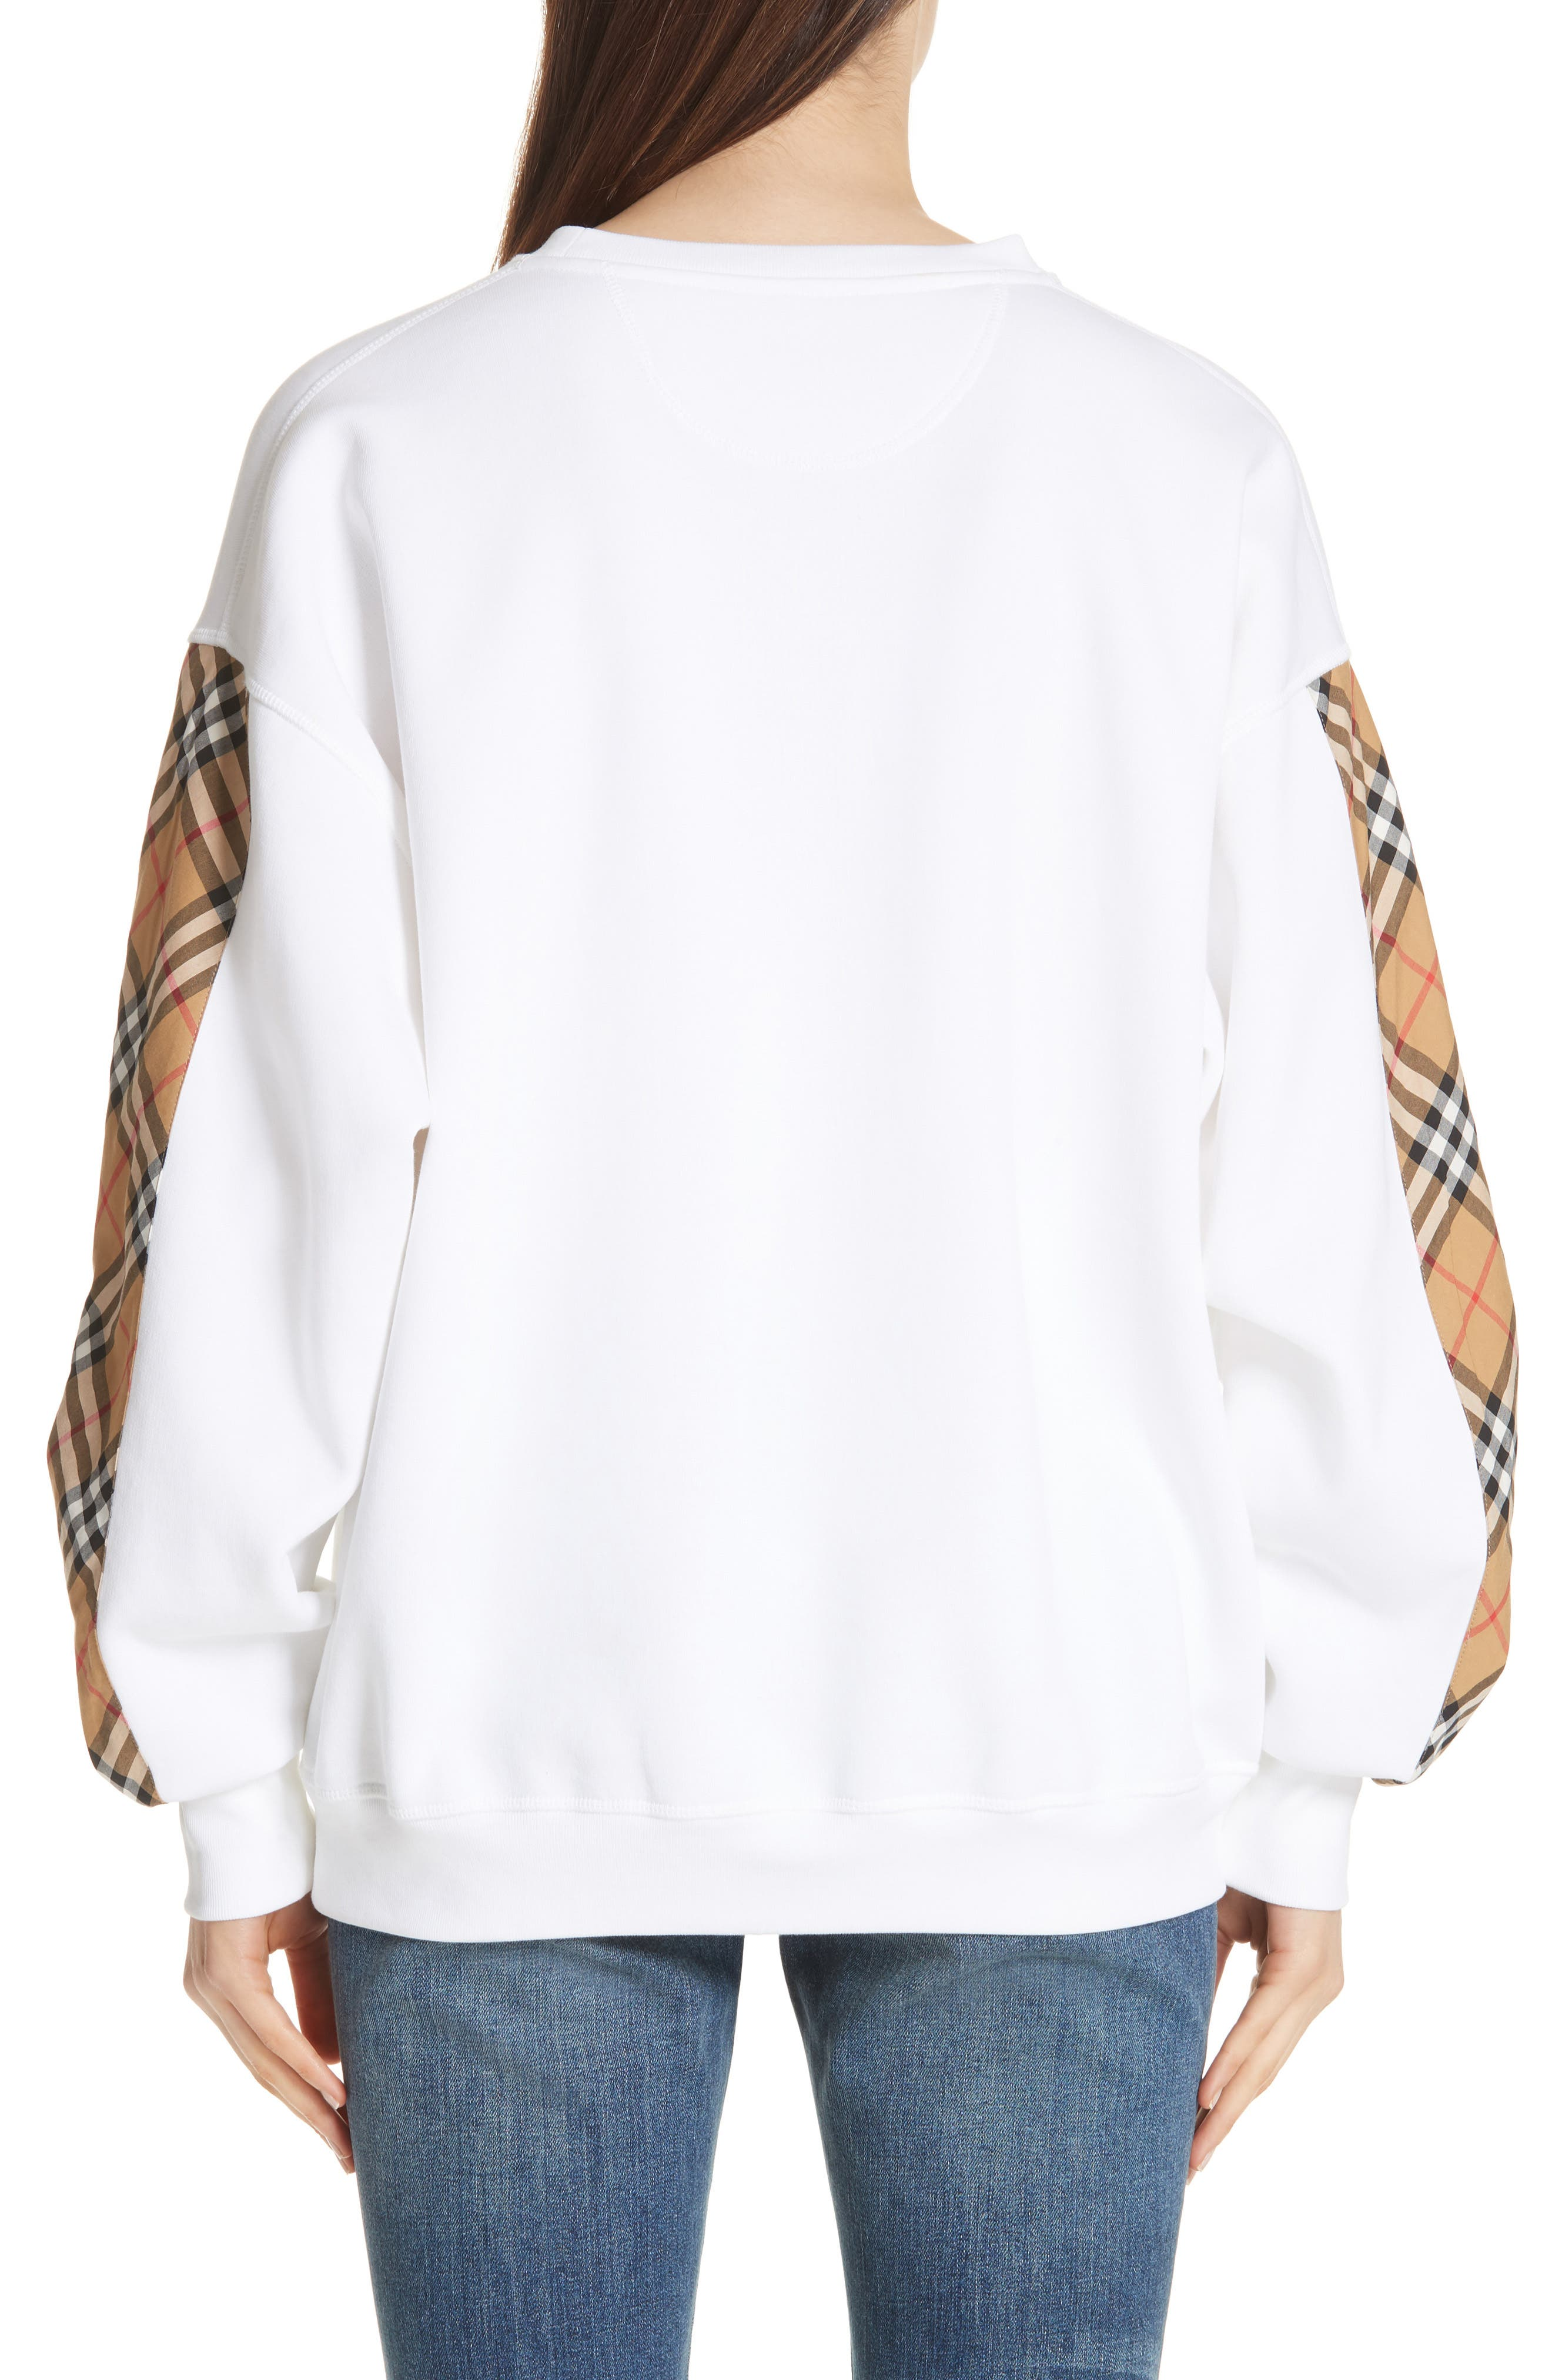 Bronx Check Sleeve Sweatshirt,                             Alternate thumbnail 2, color,                             WHITE